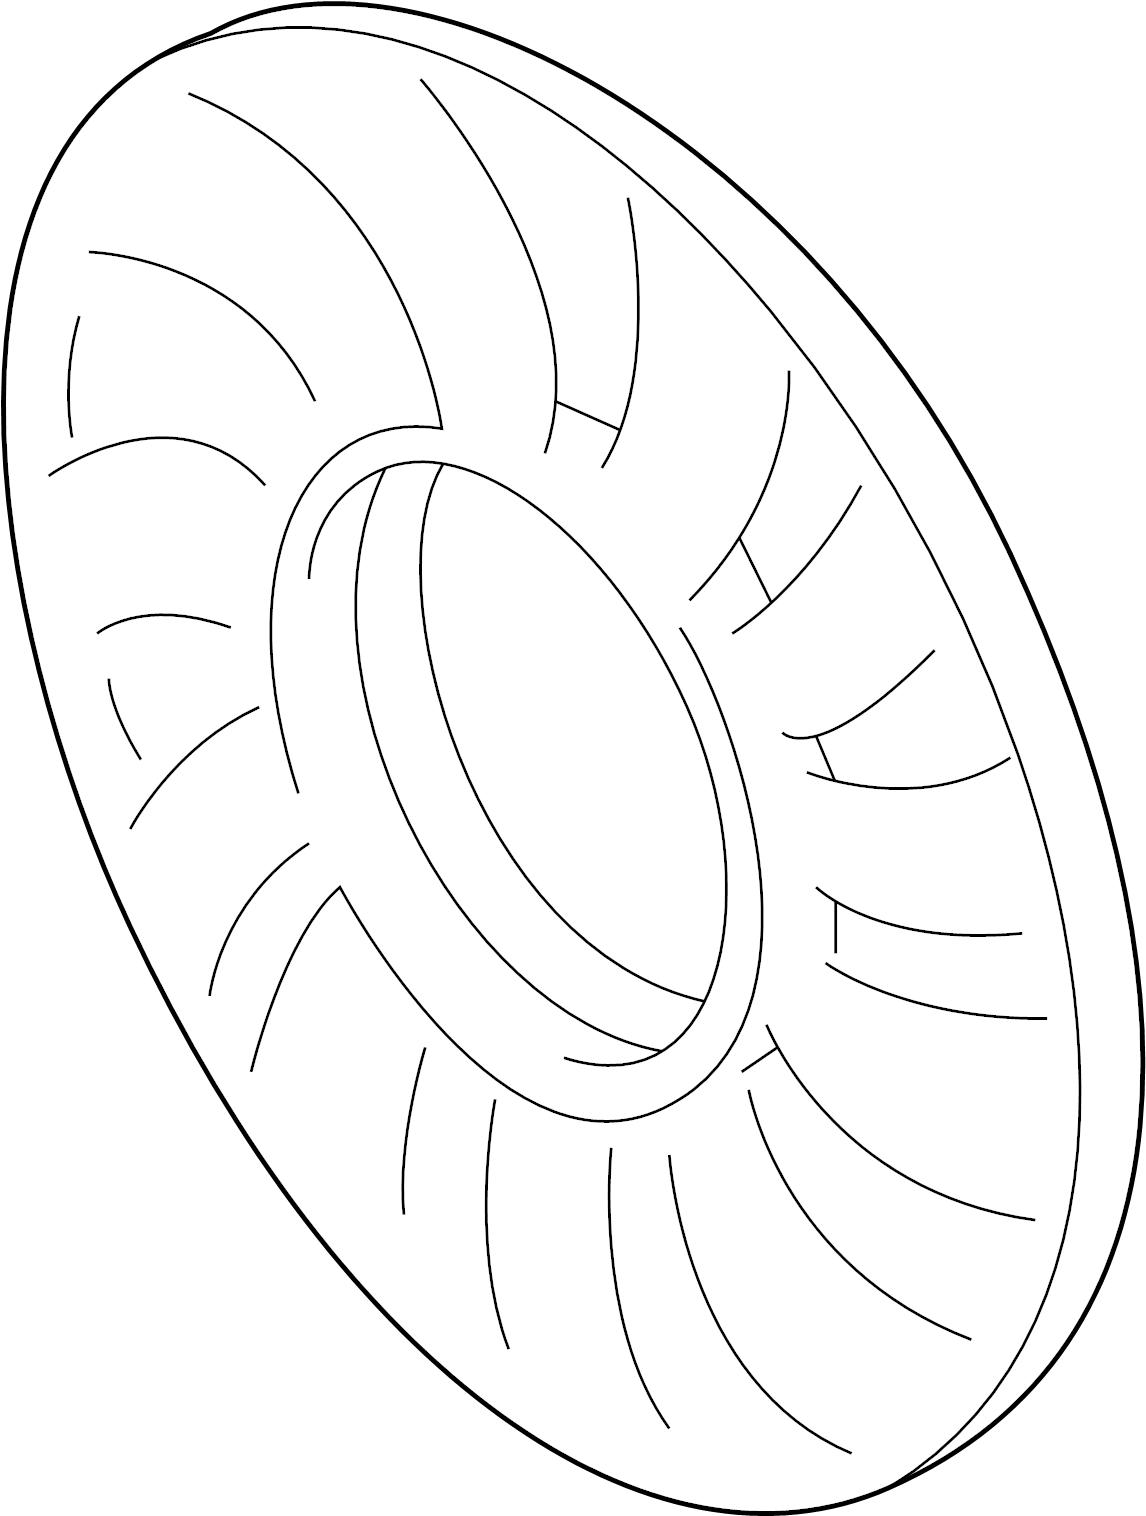 Volkswagen Passat Wagon GL TDI Wagon Engine Cooling Fan